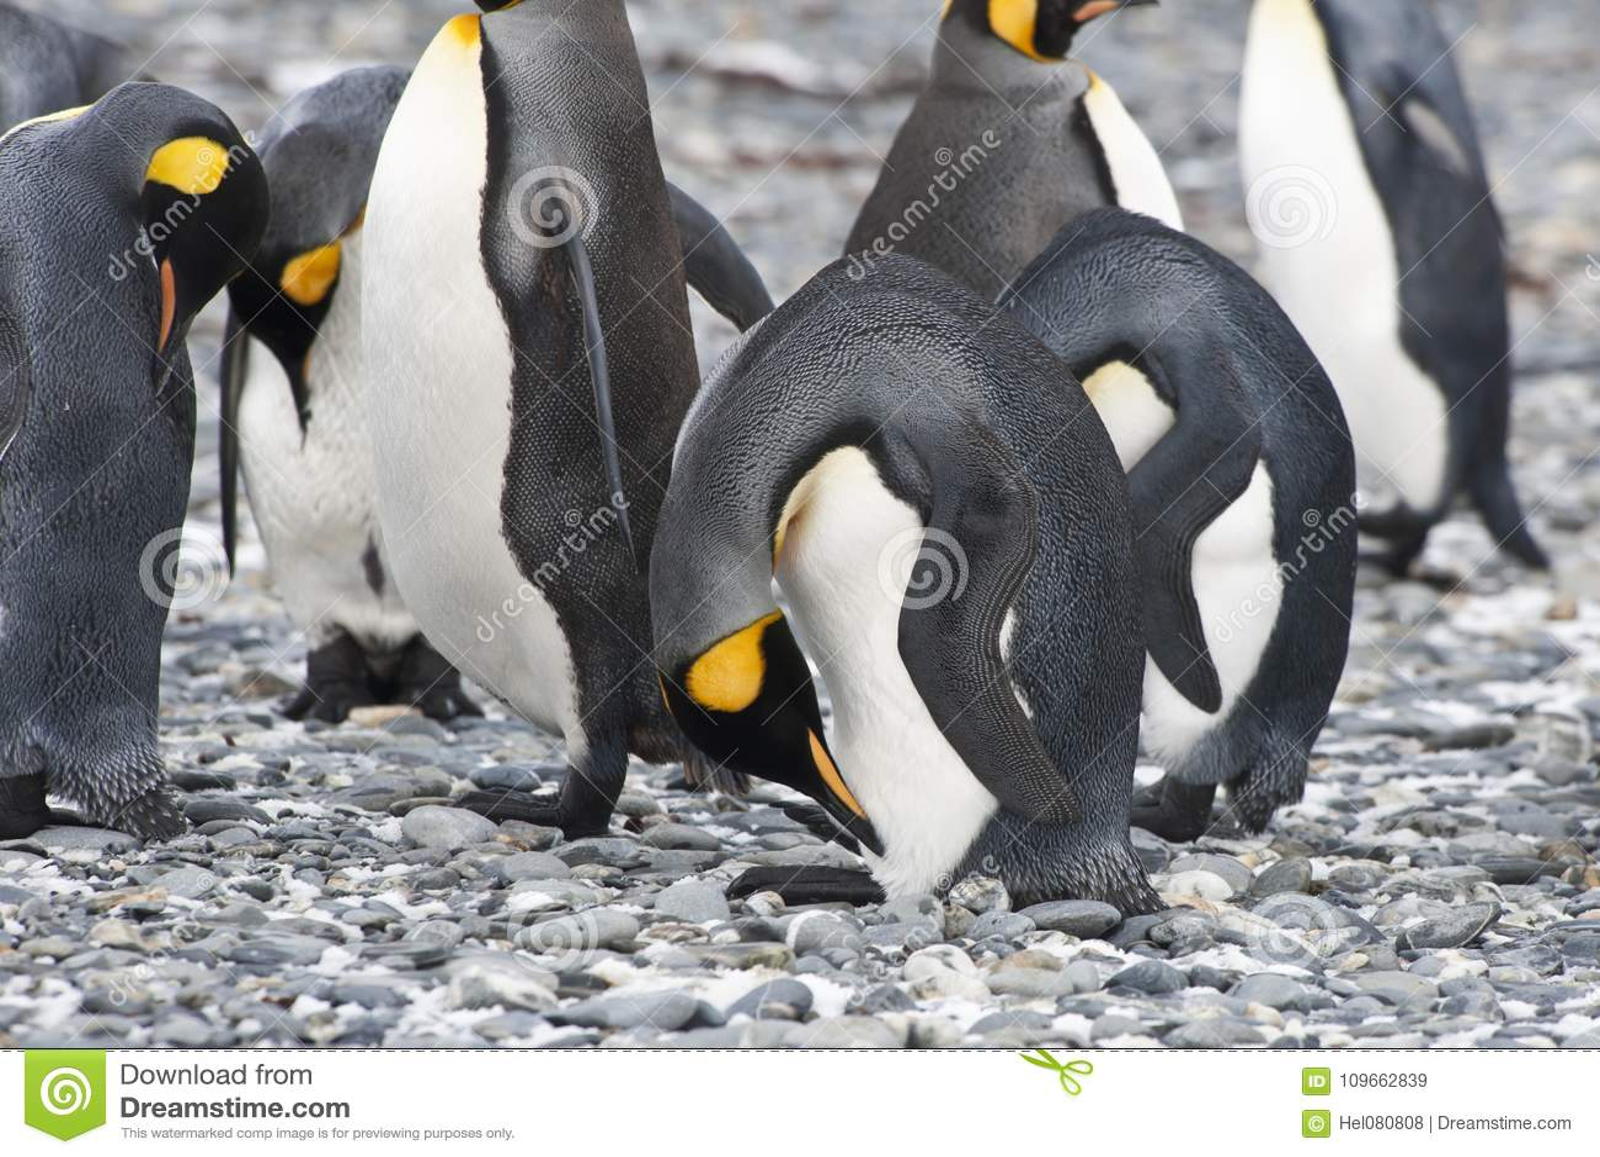 King penguins head bowed, Antarctica